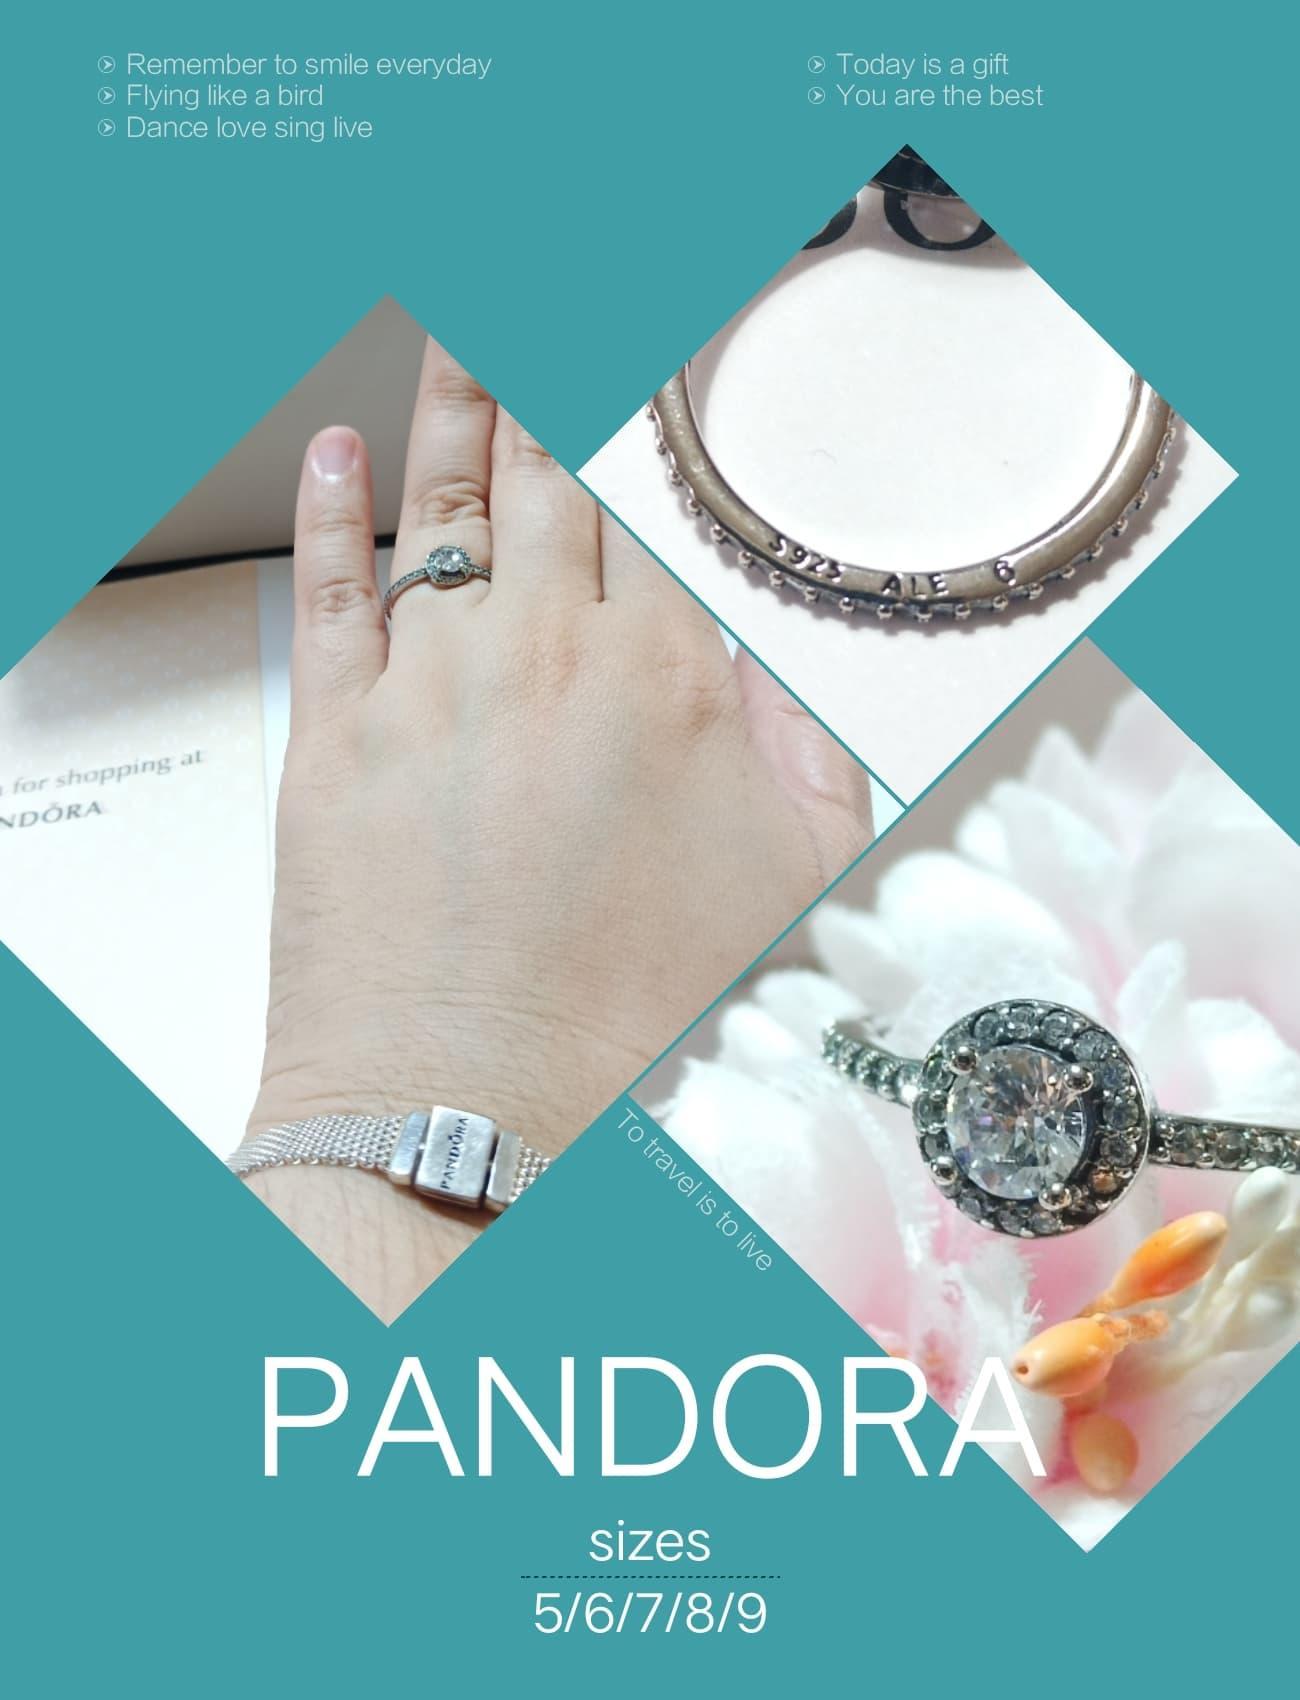 fe75cd3c9 Pandora Philippines: Pandora price list - Pandora Watches & Charms ...